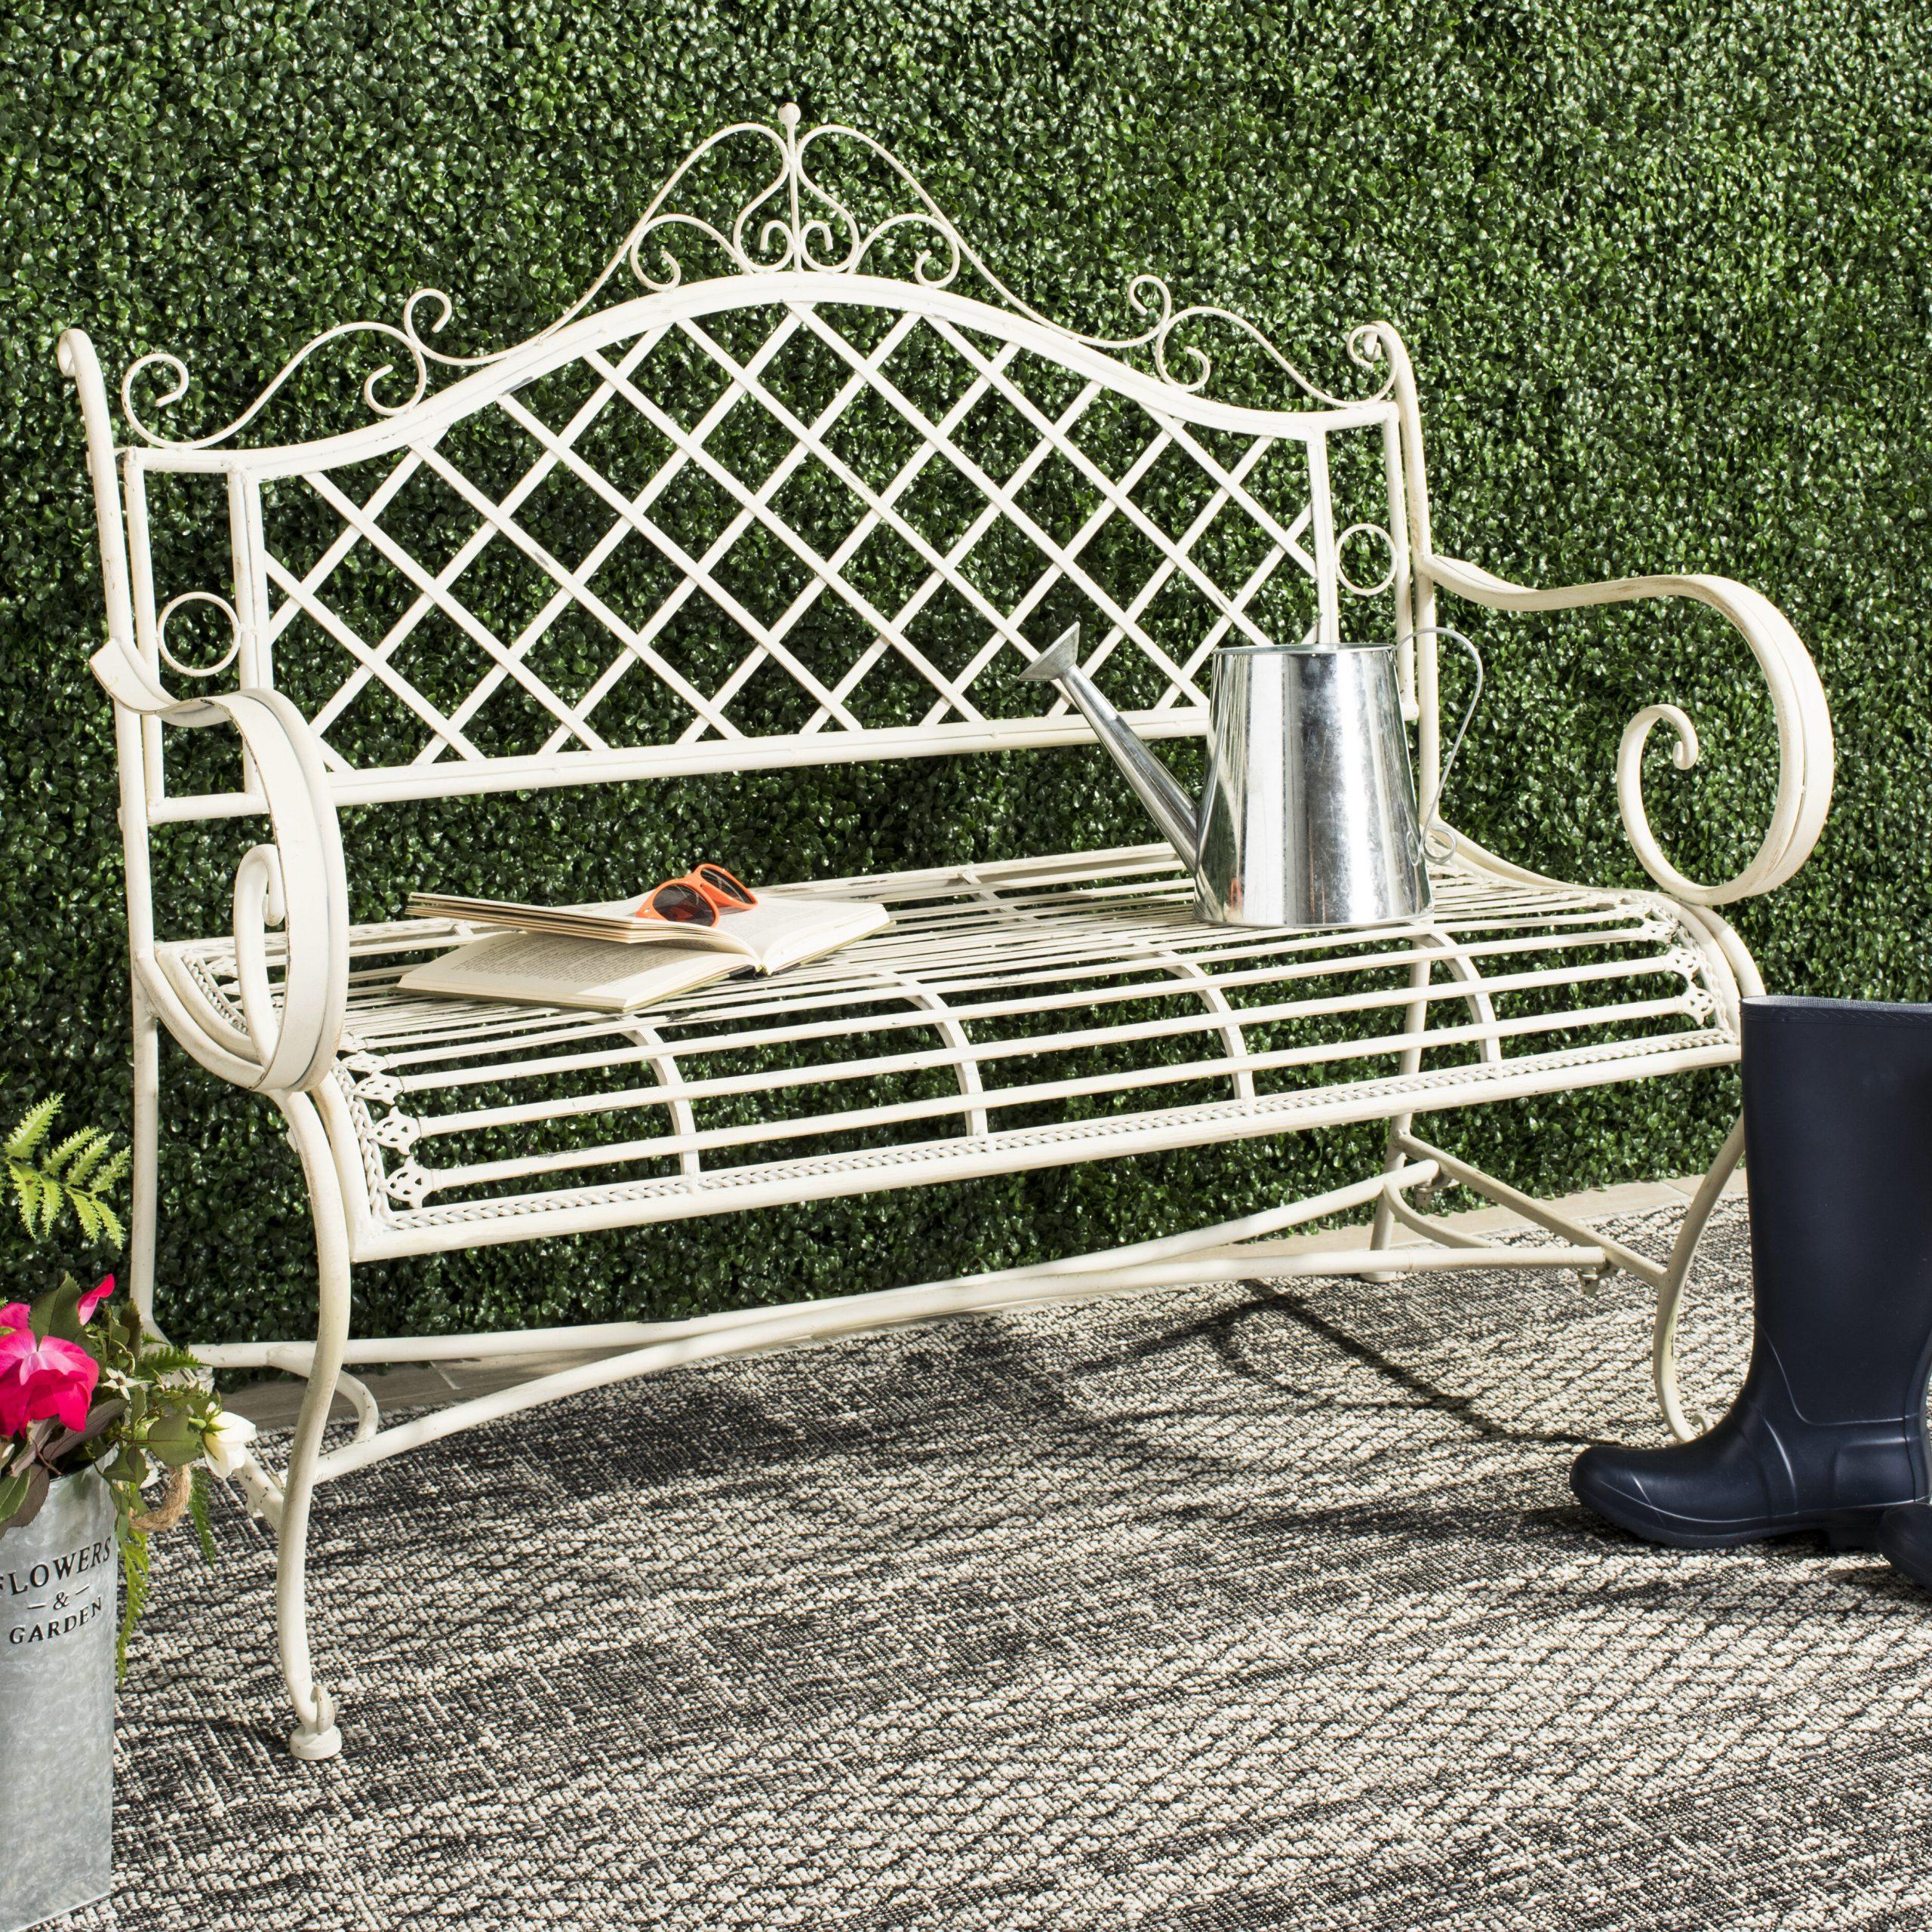 Hornellsville Wrought Iron Garden Bench Intended For Madeline Vintage Bird Cast Iron Garden Benches (View 12 of 25)